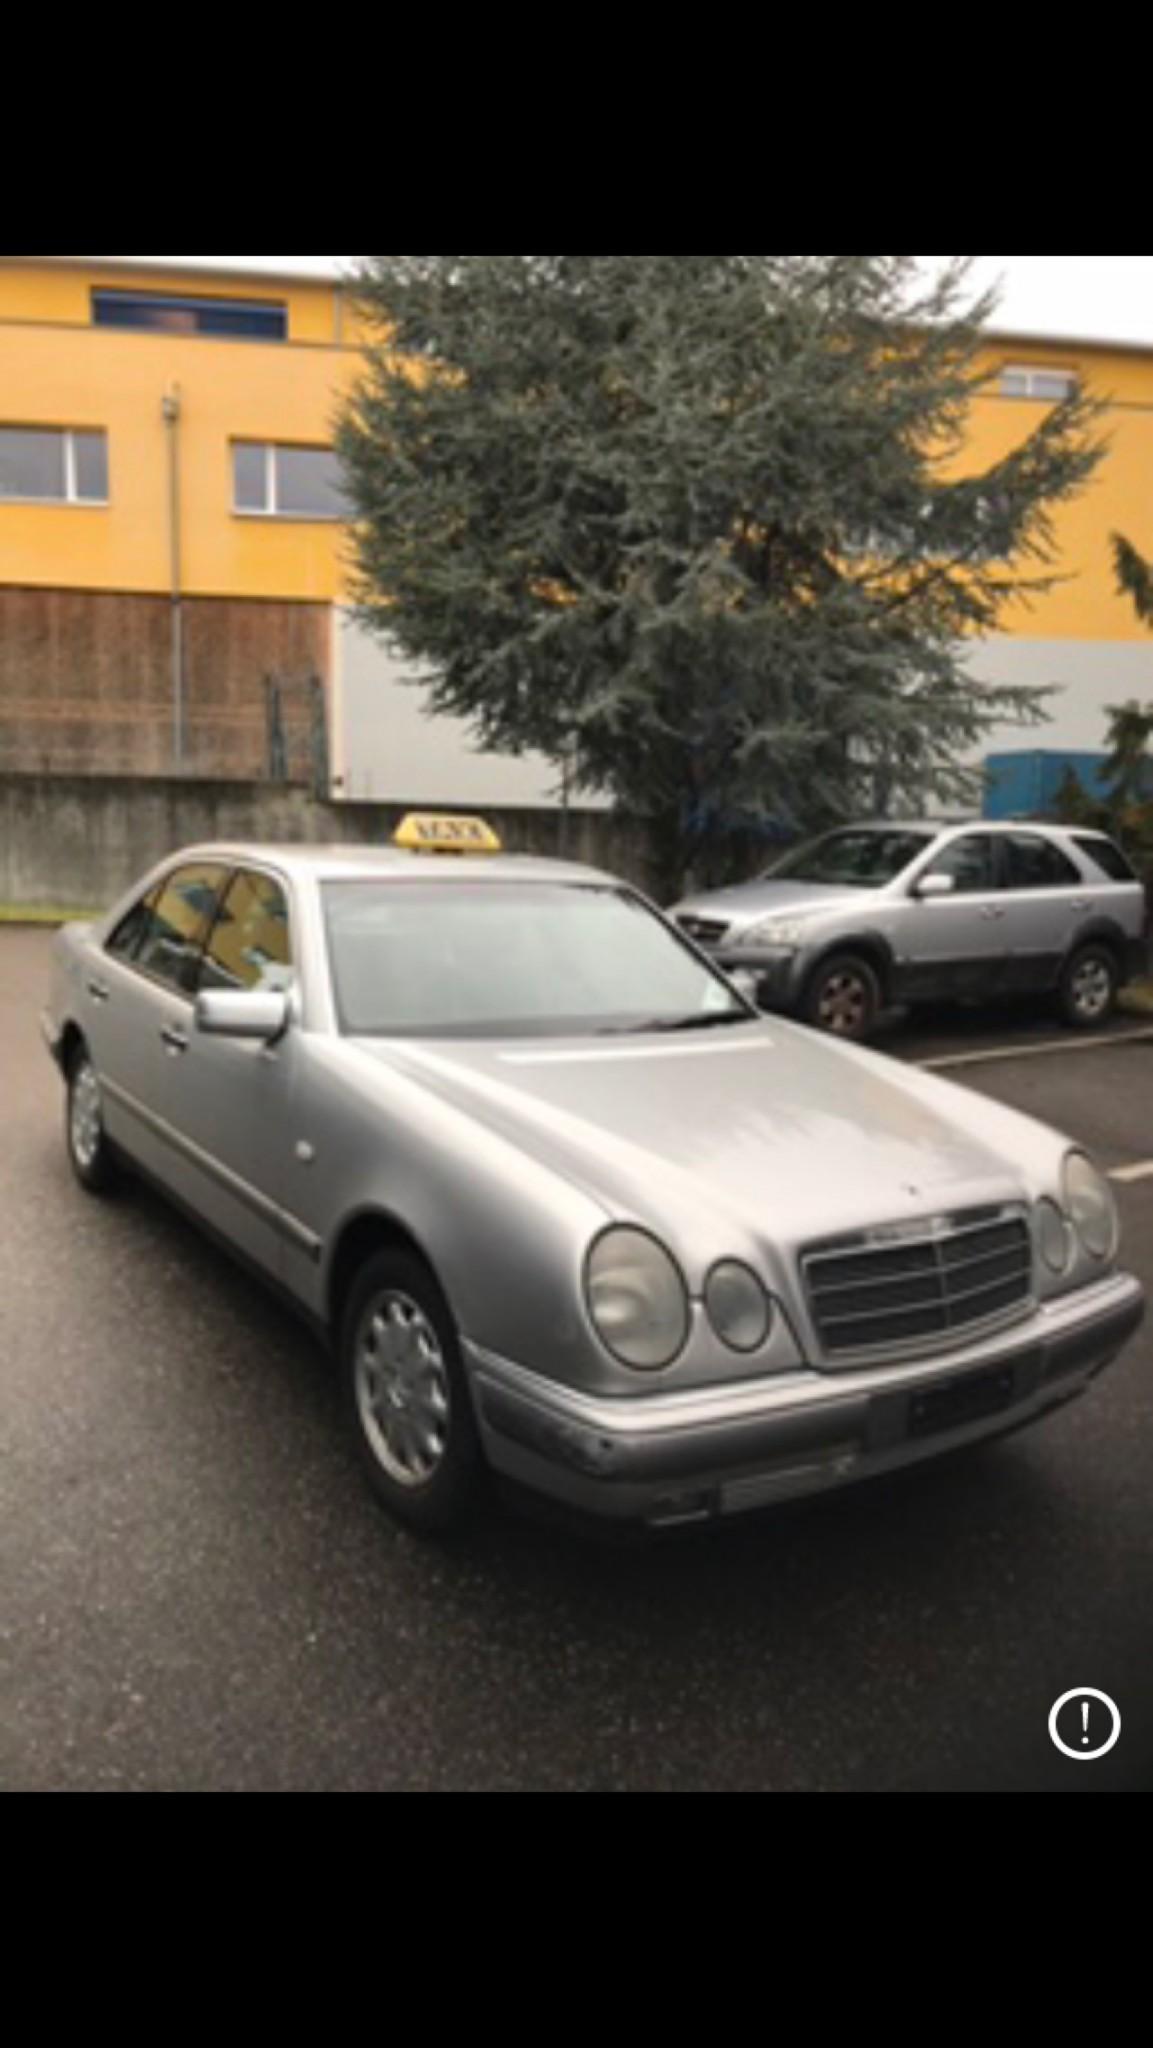 saloon Mercedes-Benz E-Klasse Mercedes benz E230 FrischMFK 28.02.2020